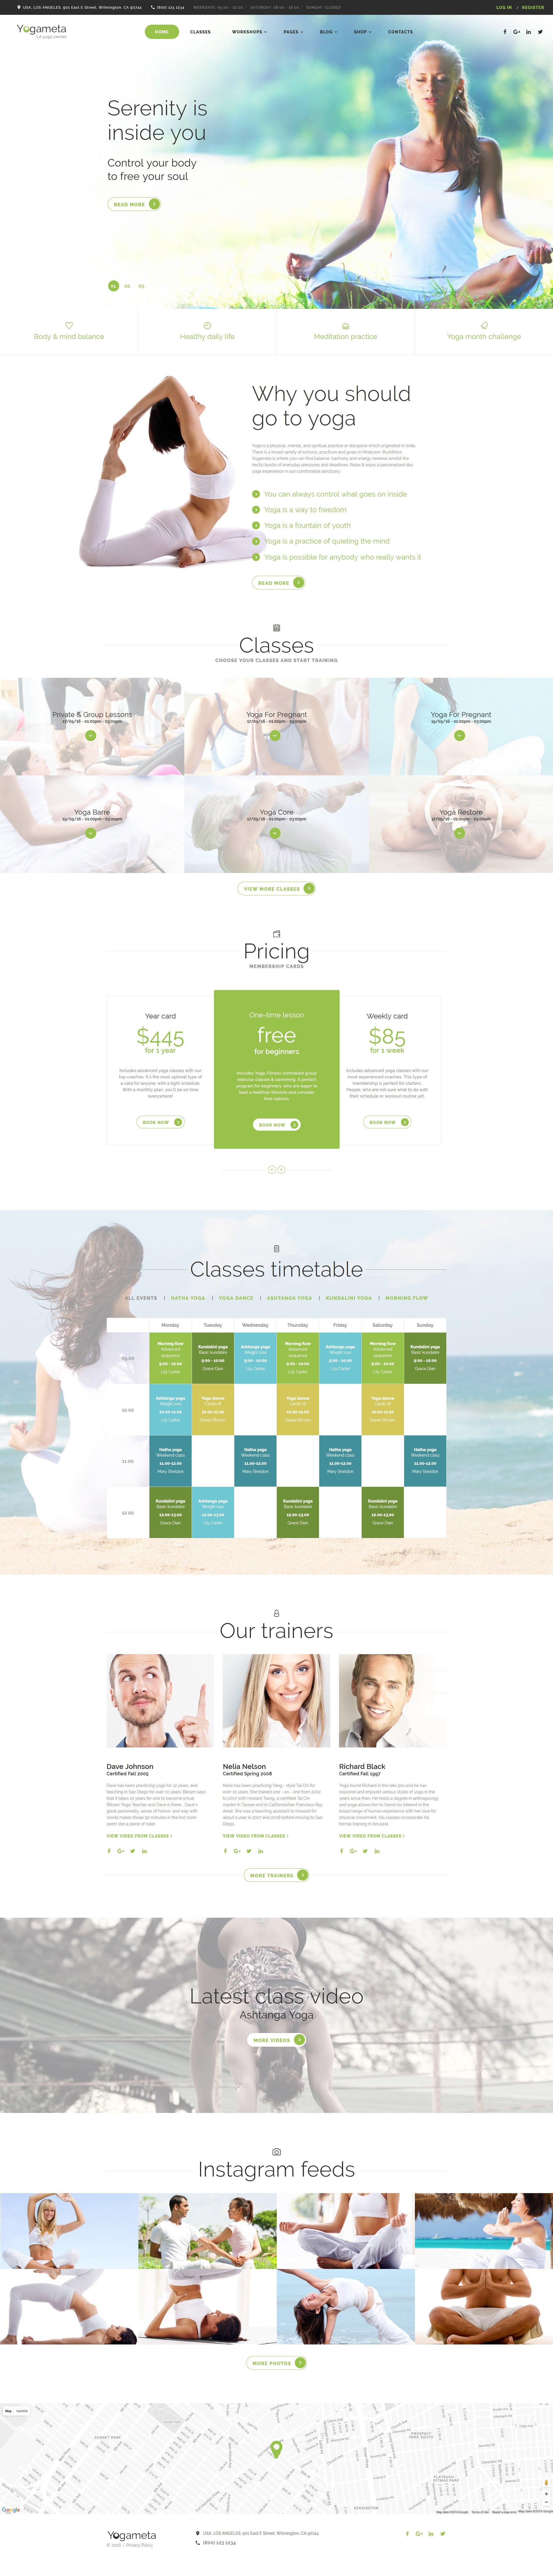 Plantilla Web #58908 para Sitio de Yoga